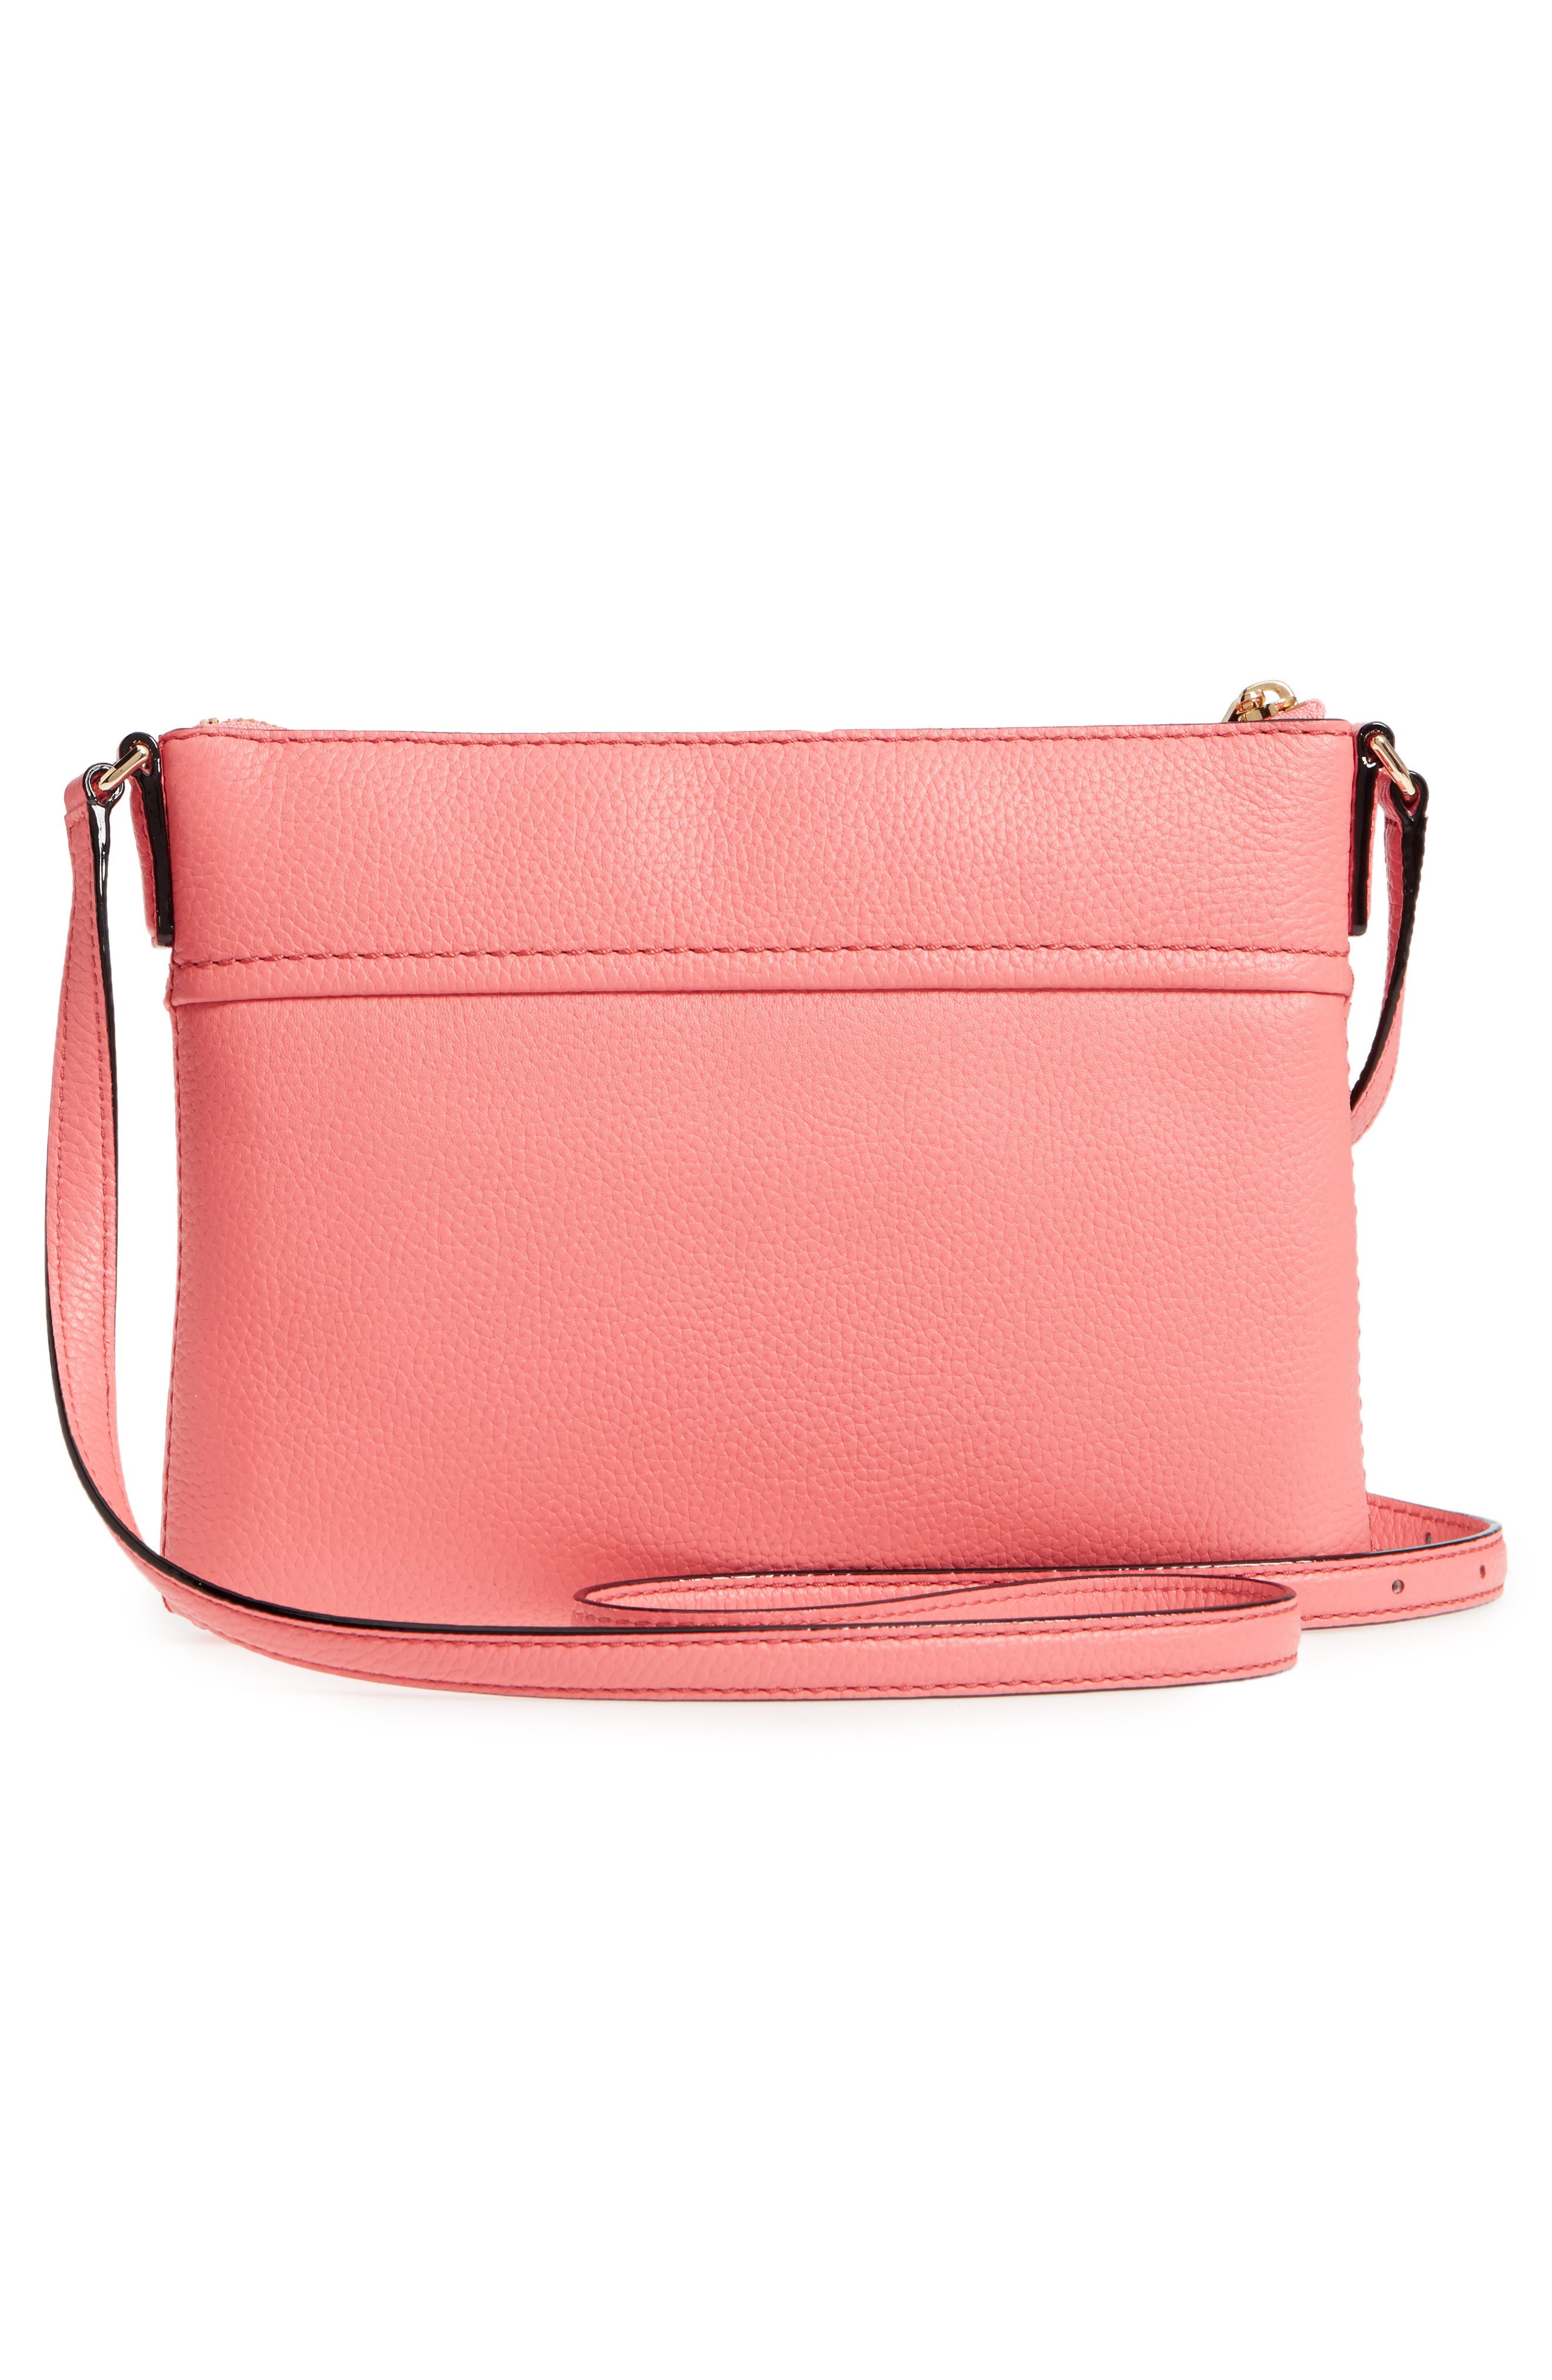 jackson street - gabriele leather crossbody bag,                             Alternate thumbnail 3, color,                             Coral Pebble